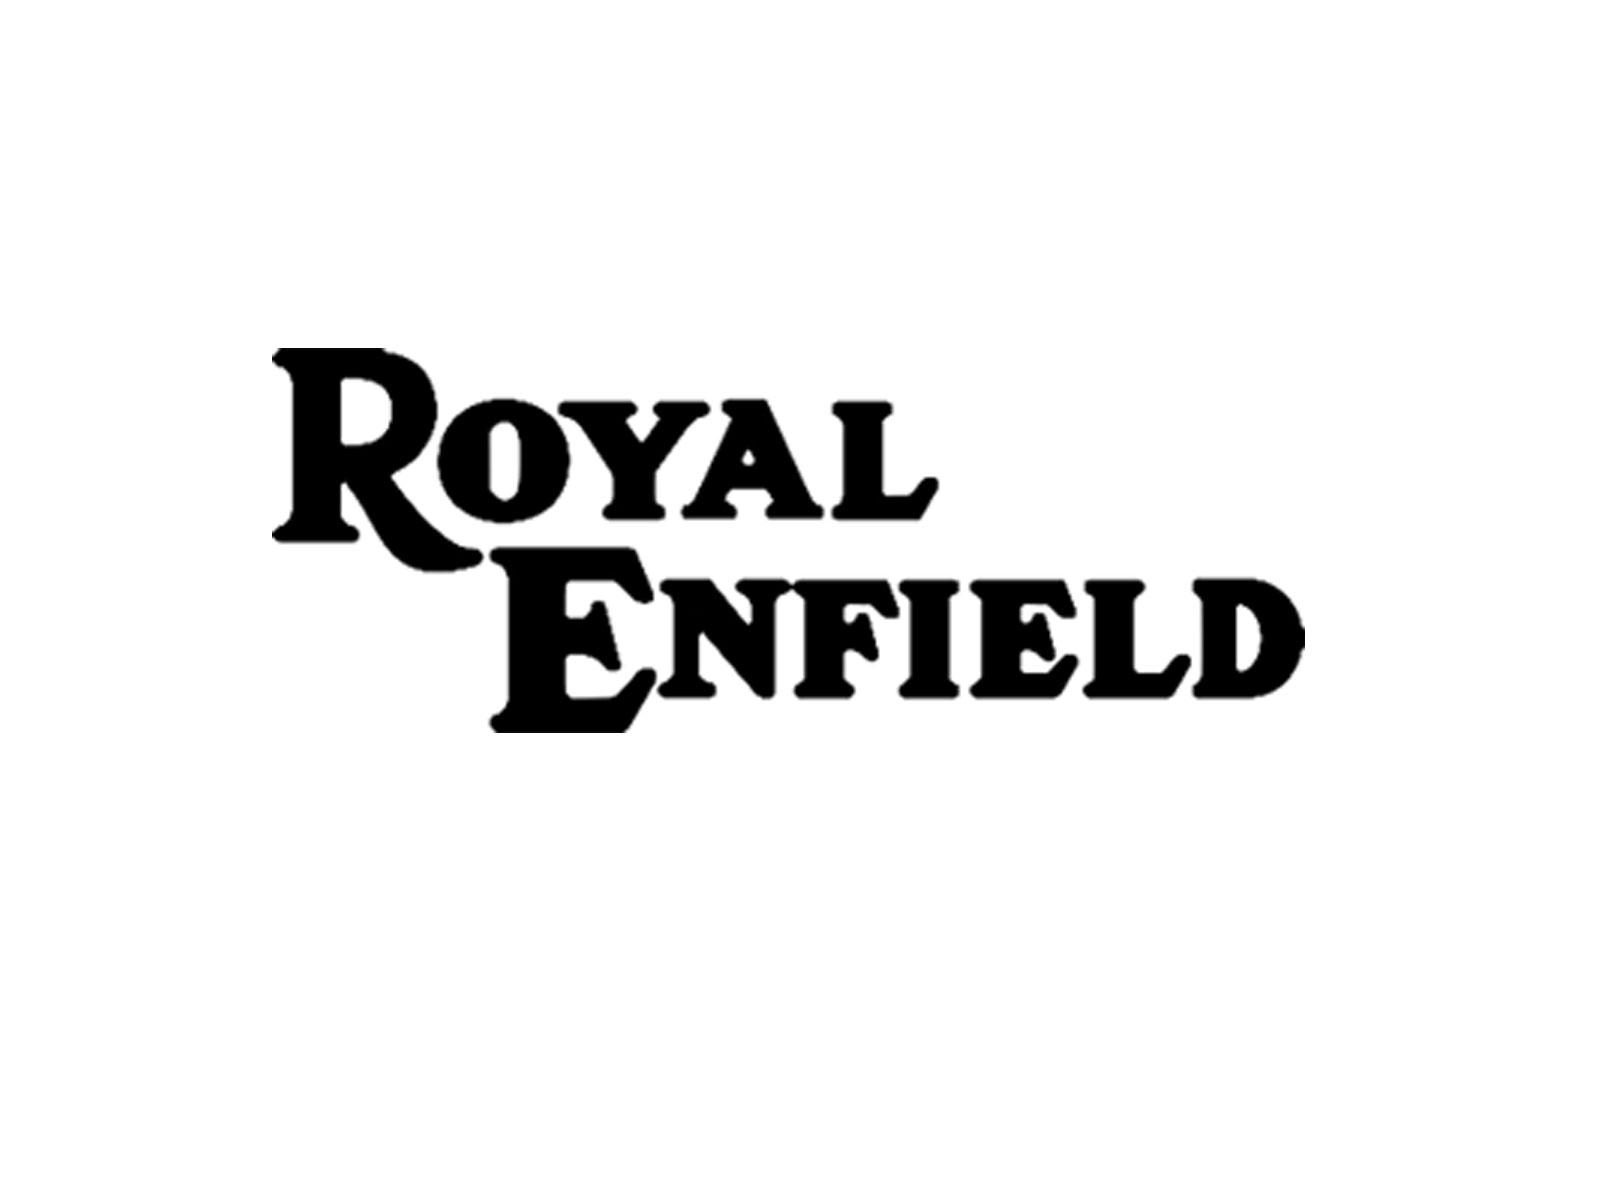 Royal Enfield – Intian osia